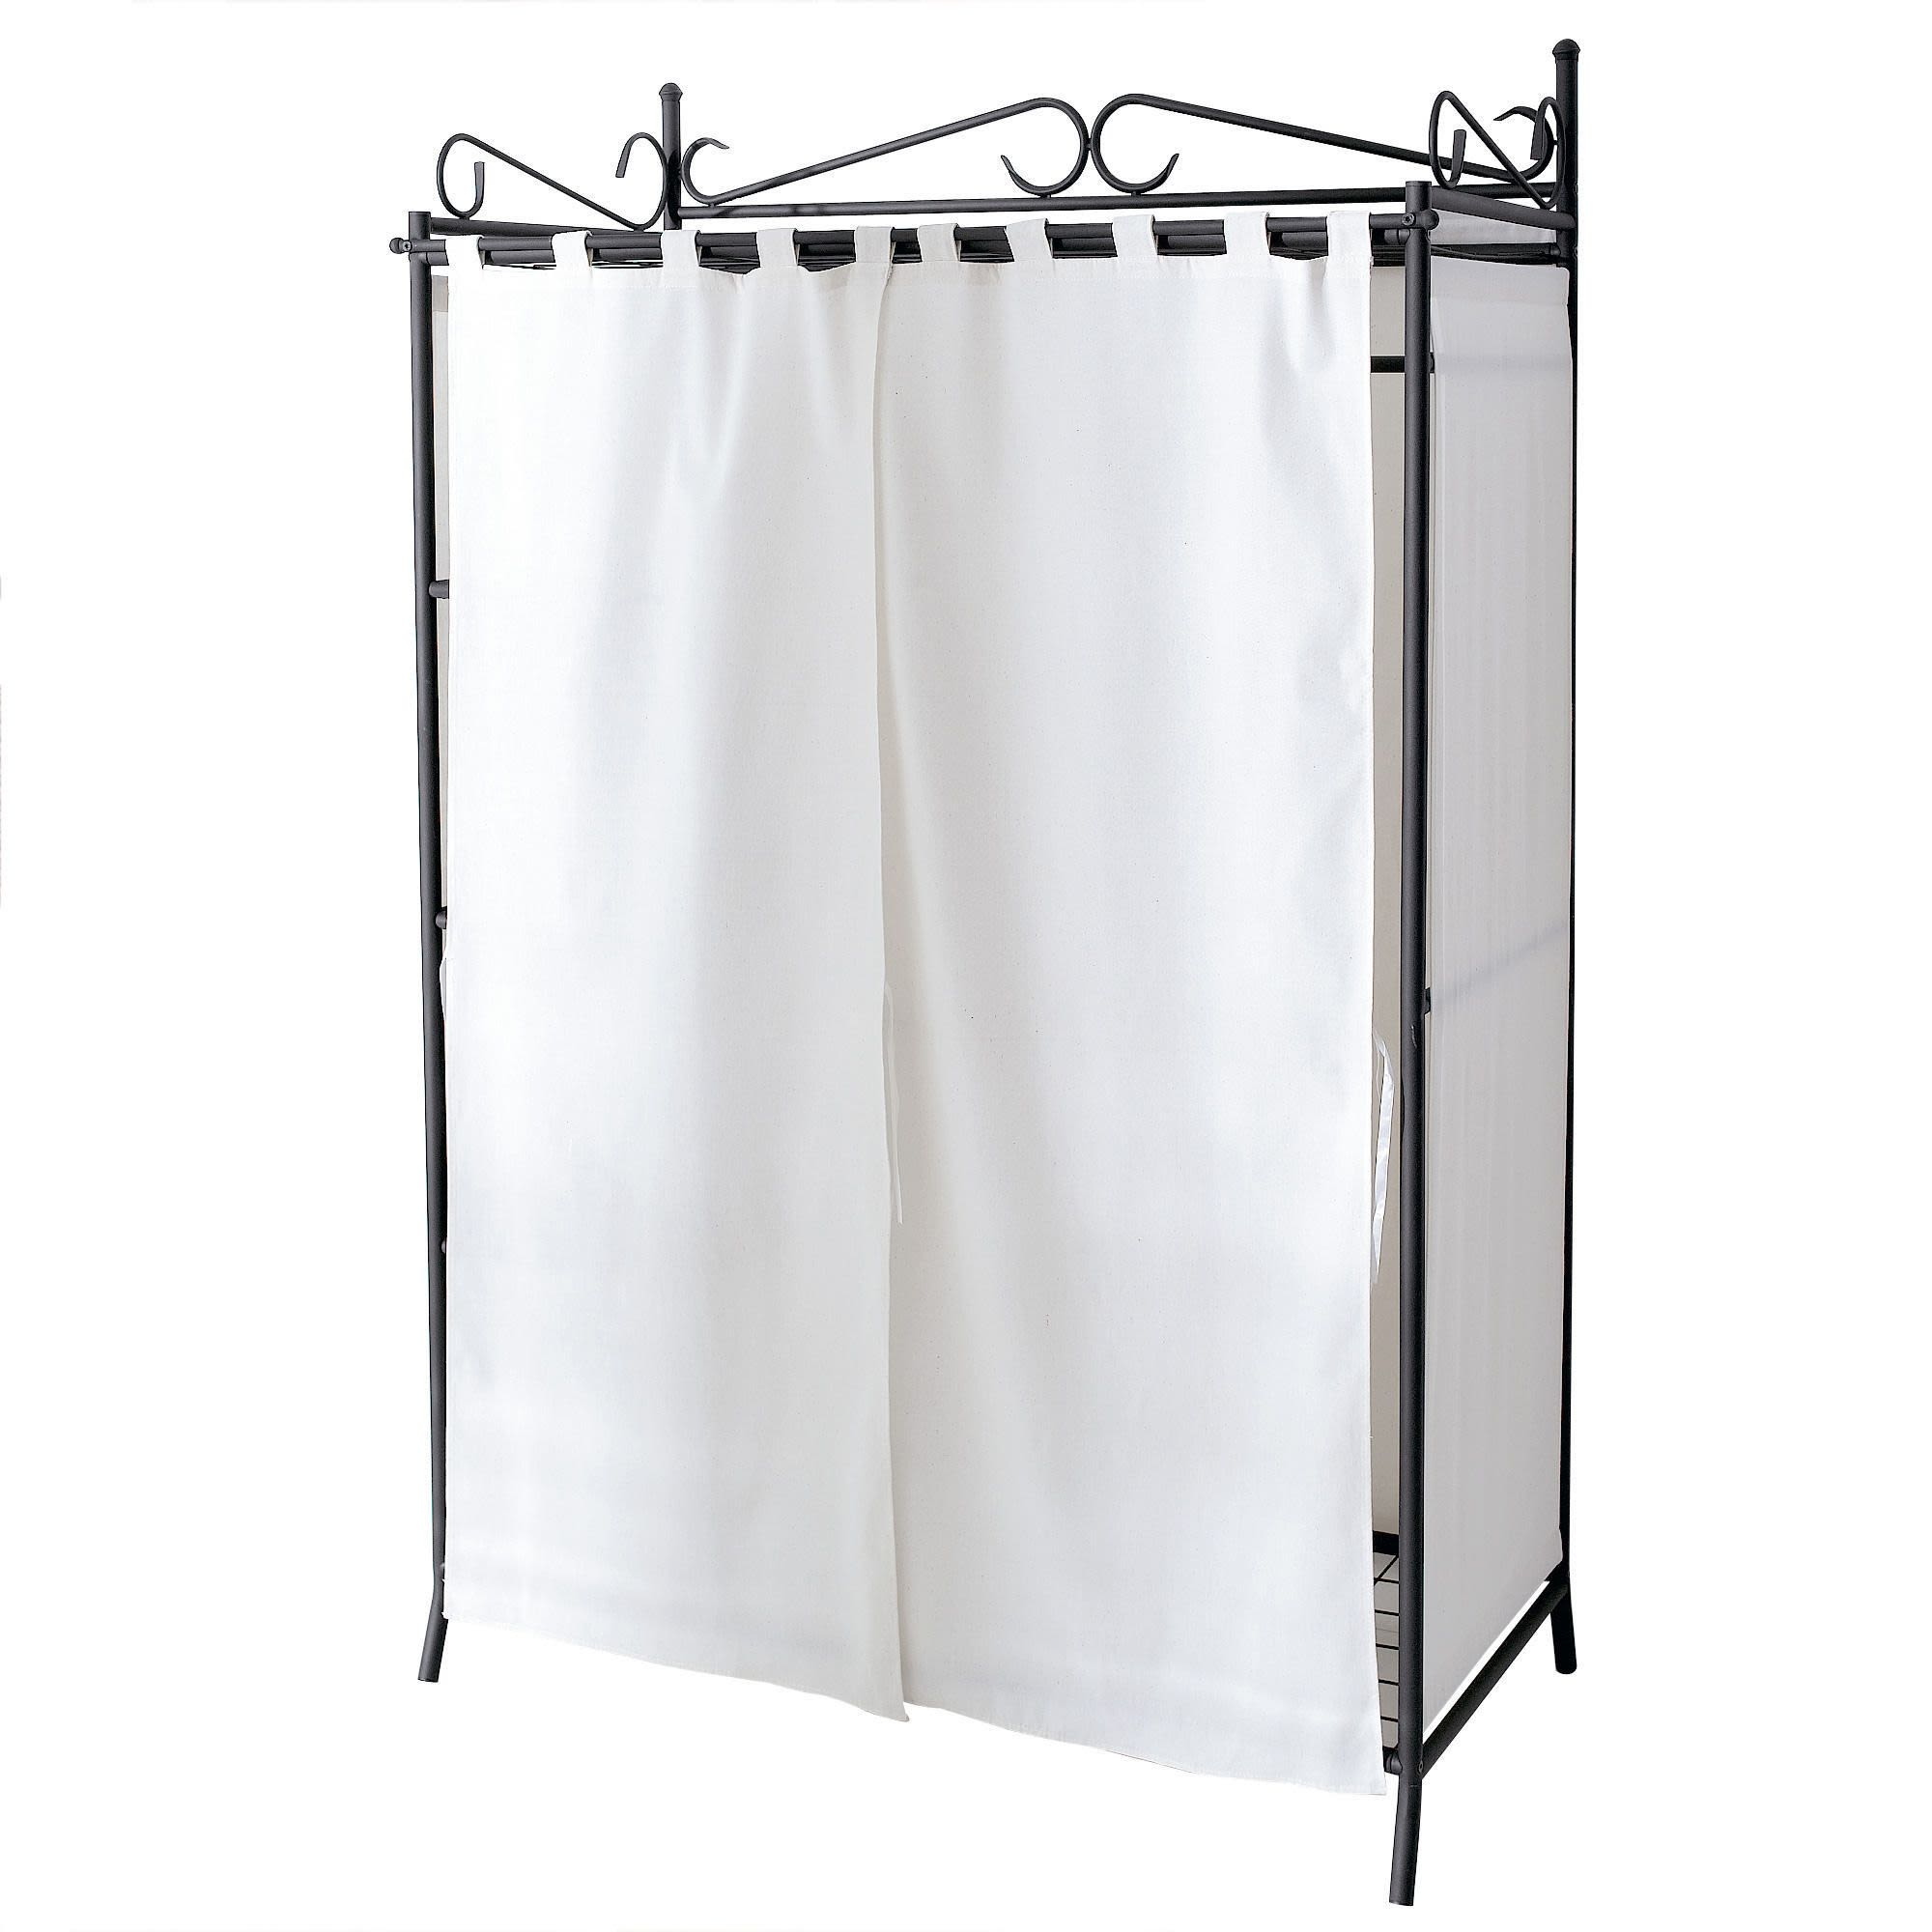 Kleiderschrank Air, inkl. Vorhang, Metall, ca.: H172 cm